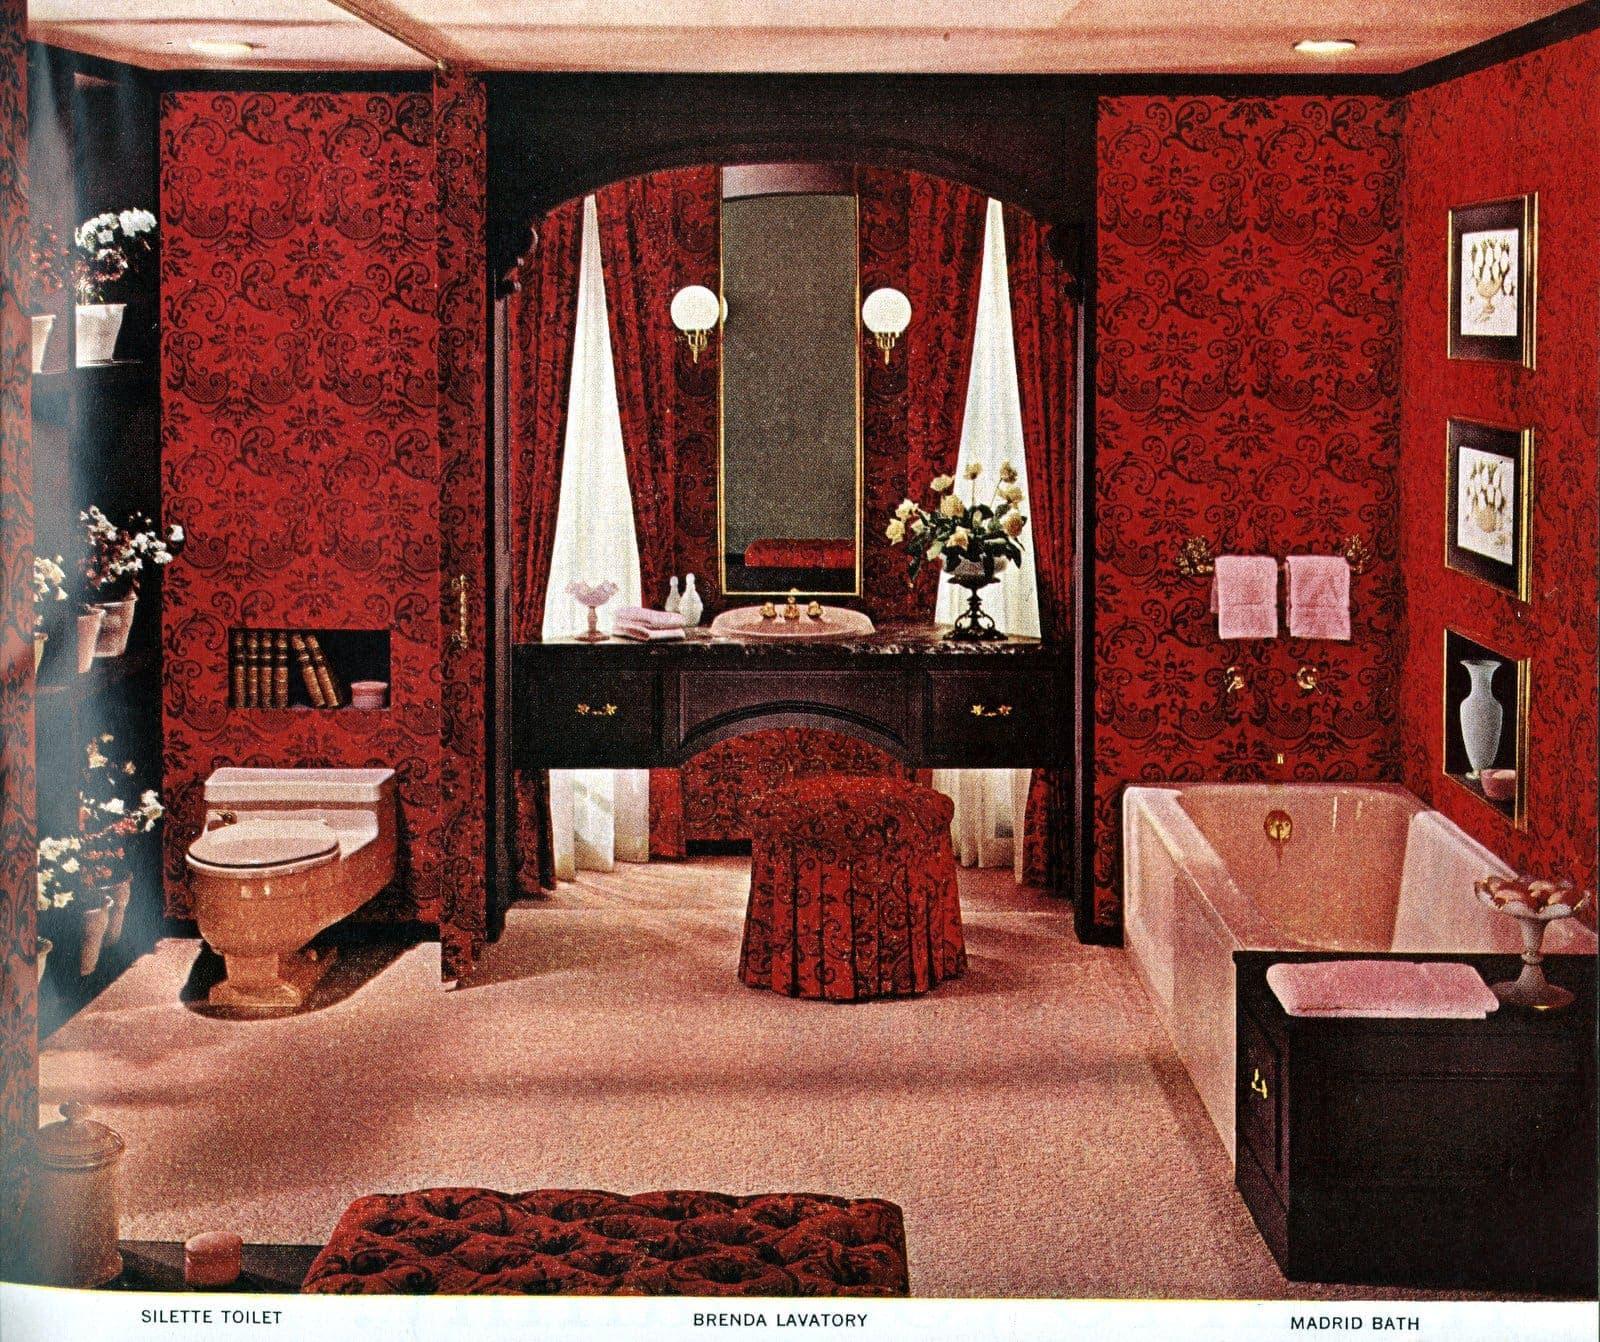 Elegant red bathroom with rich fabric walls drapes